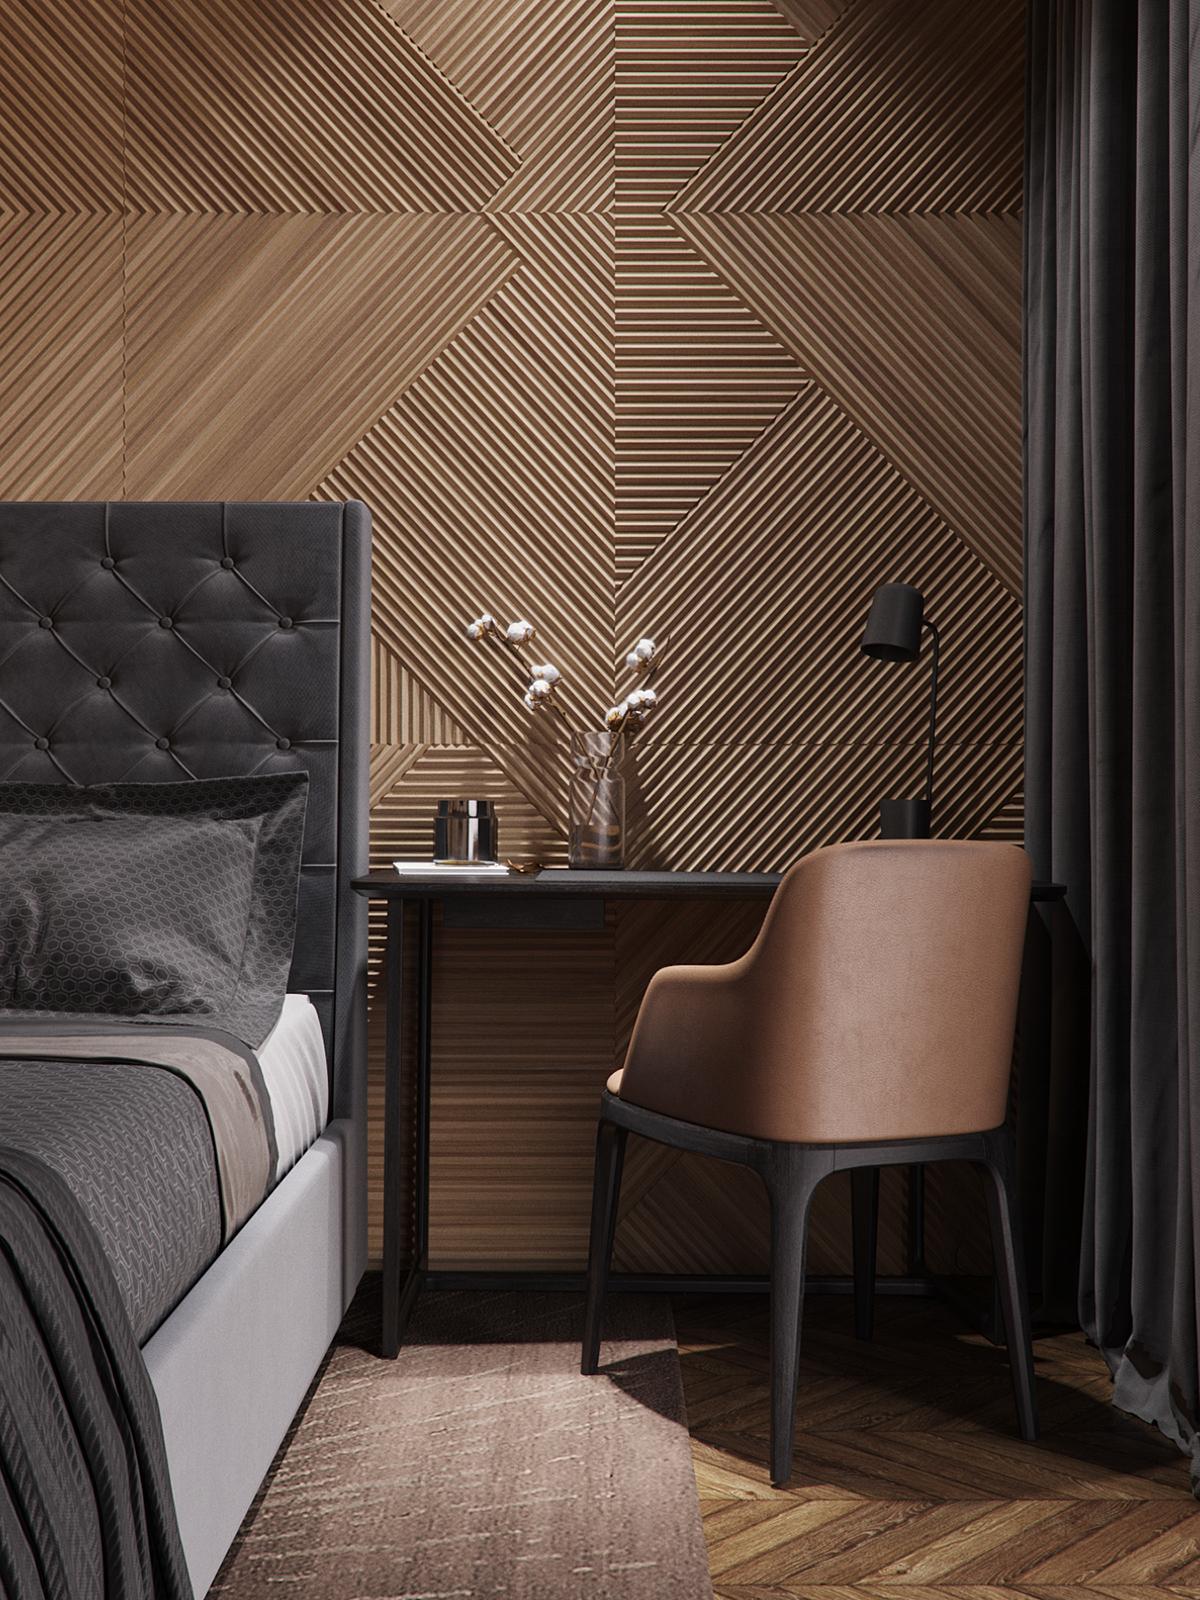 bruine slaapkamer interieur